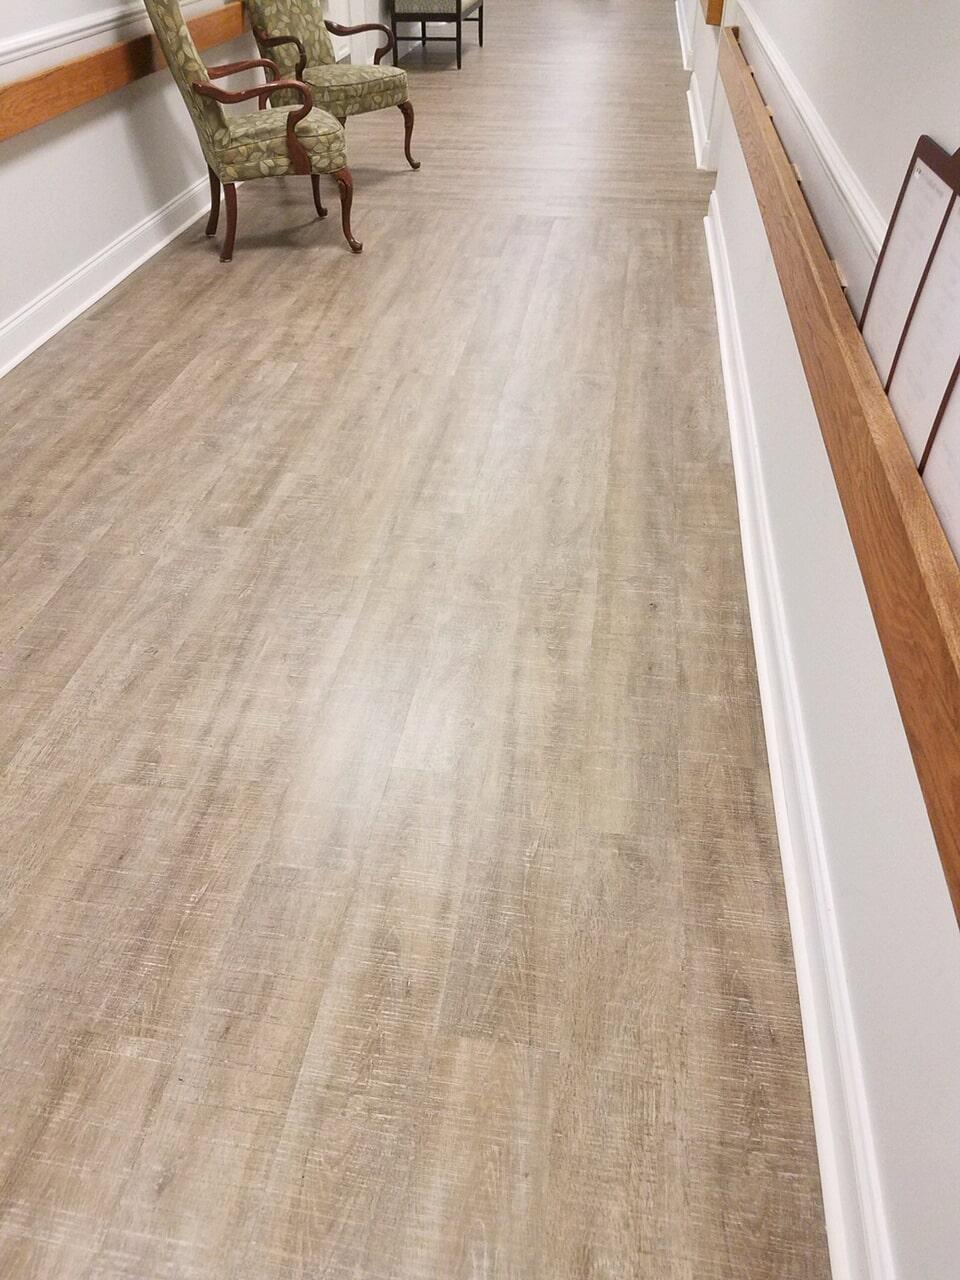 Hardwood from The Flooring Center in Winter Park, FL